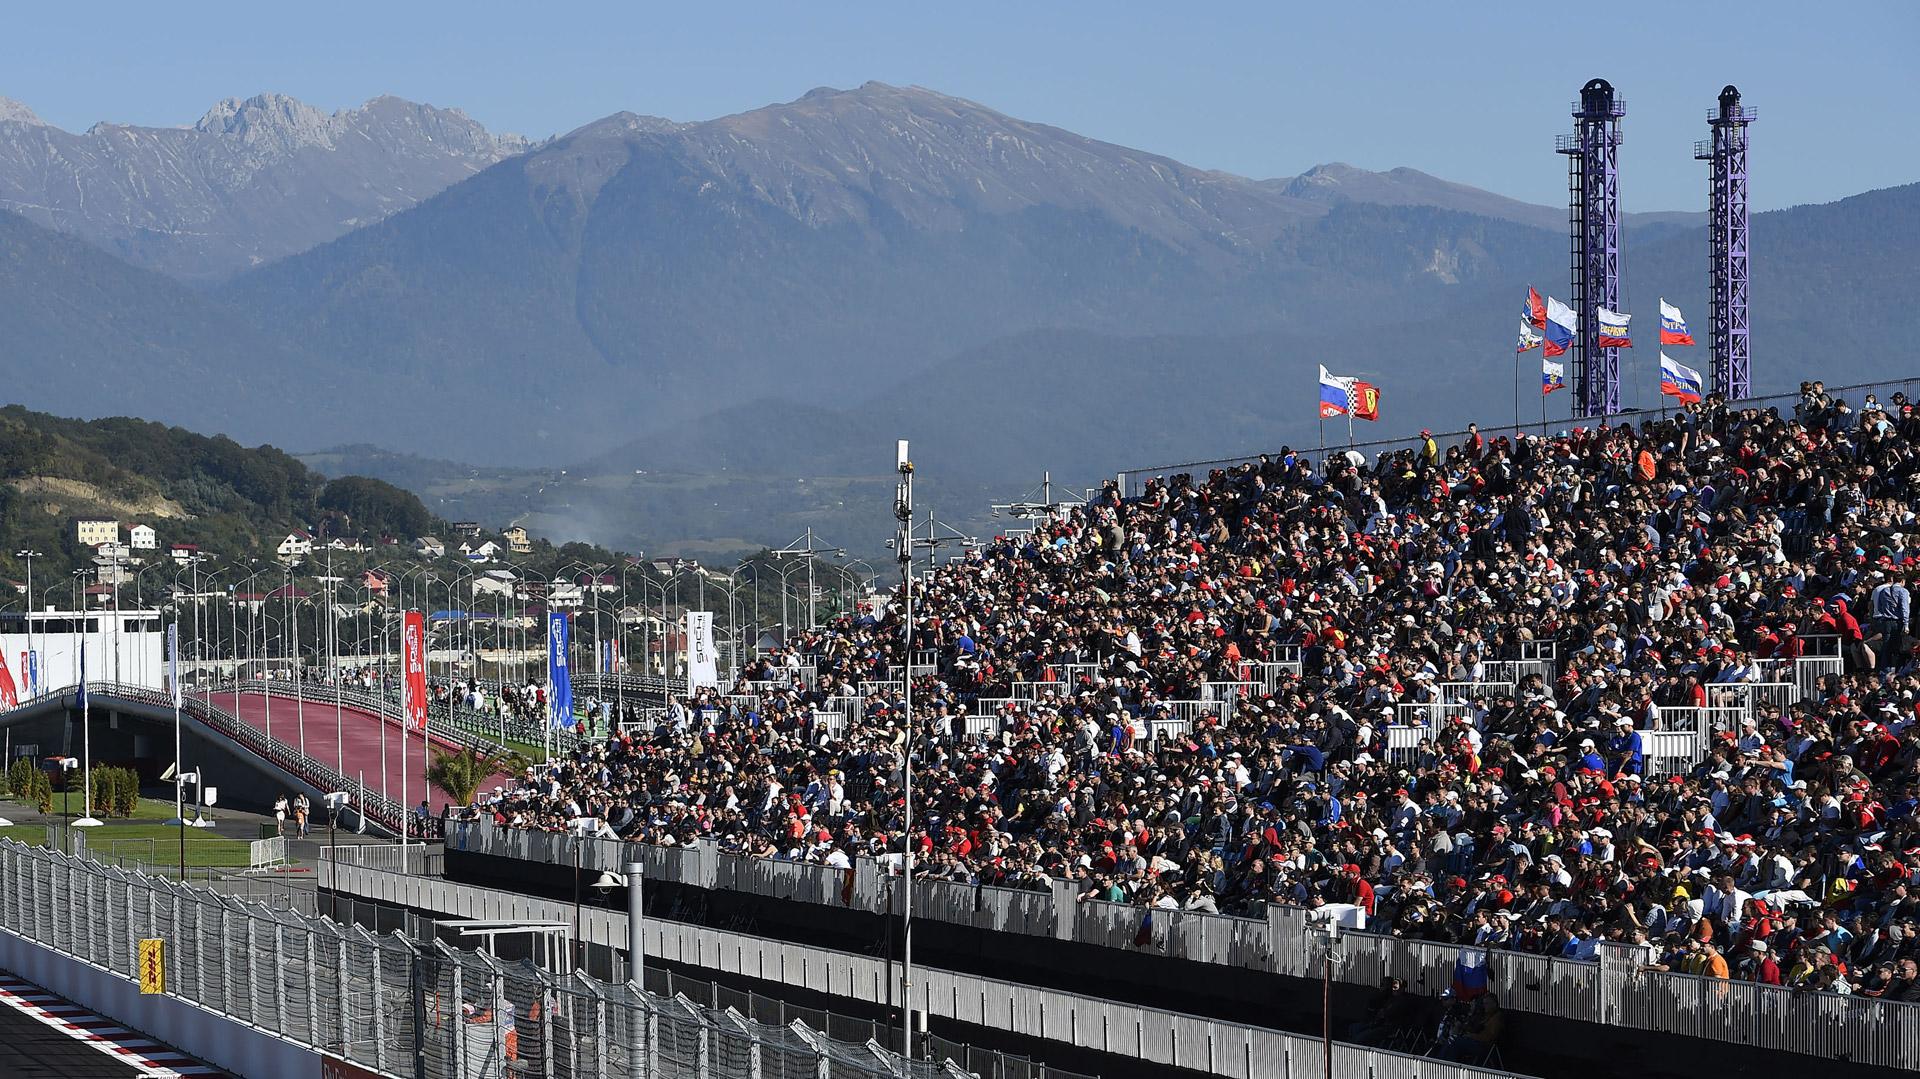 sochi-autodrom-home-of-the-formula-one-russian-grand-prix_100530016_h